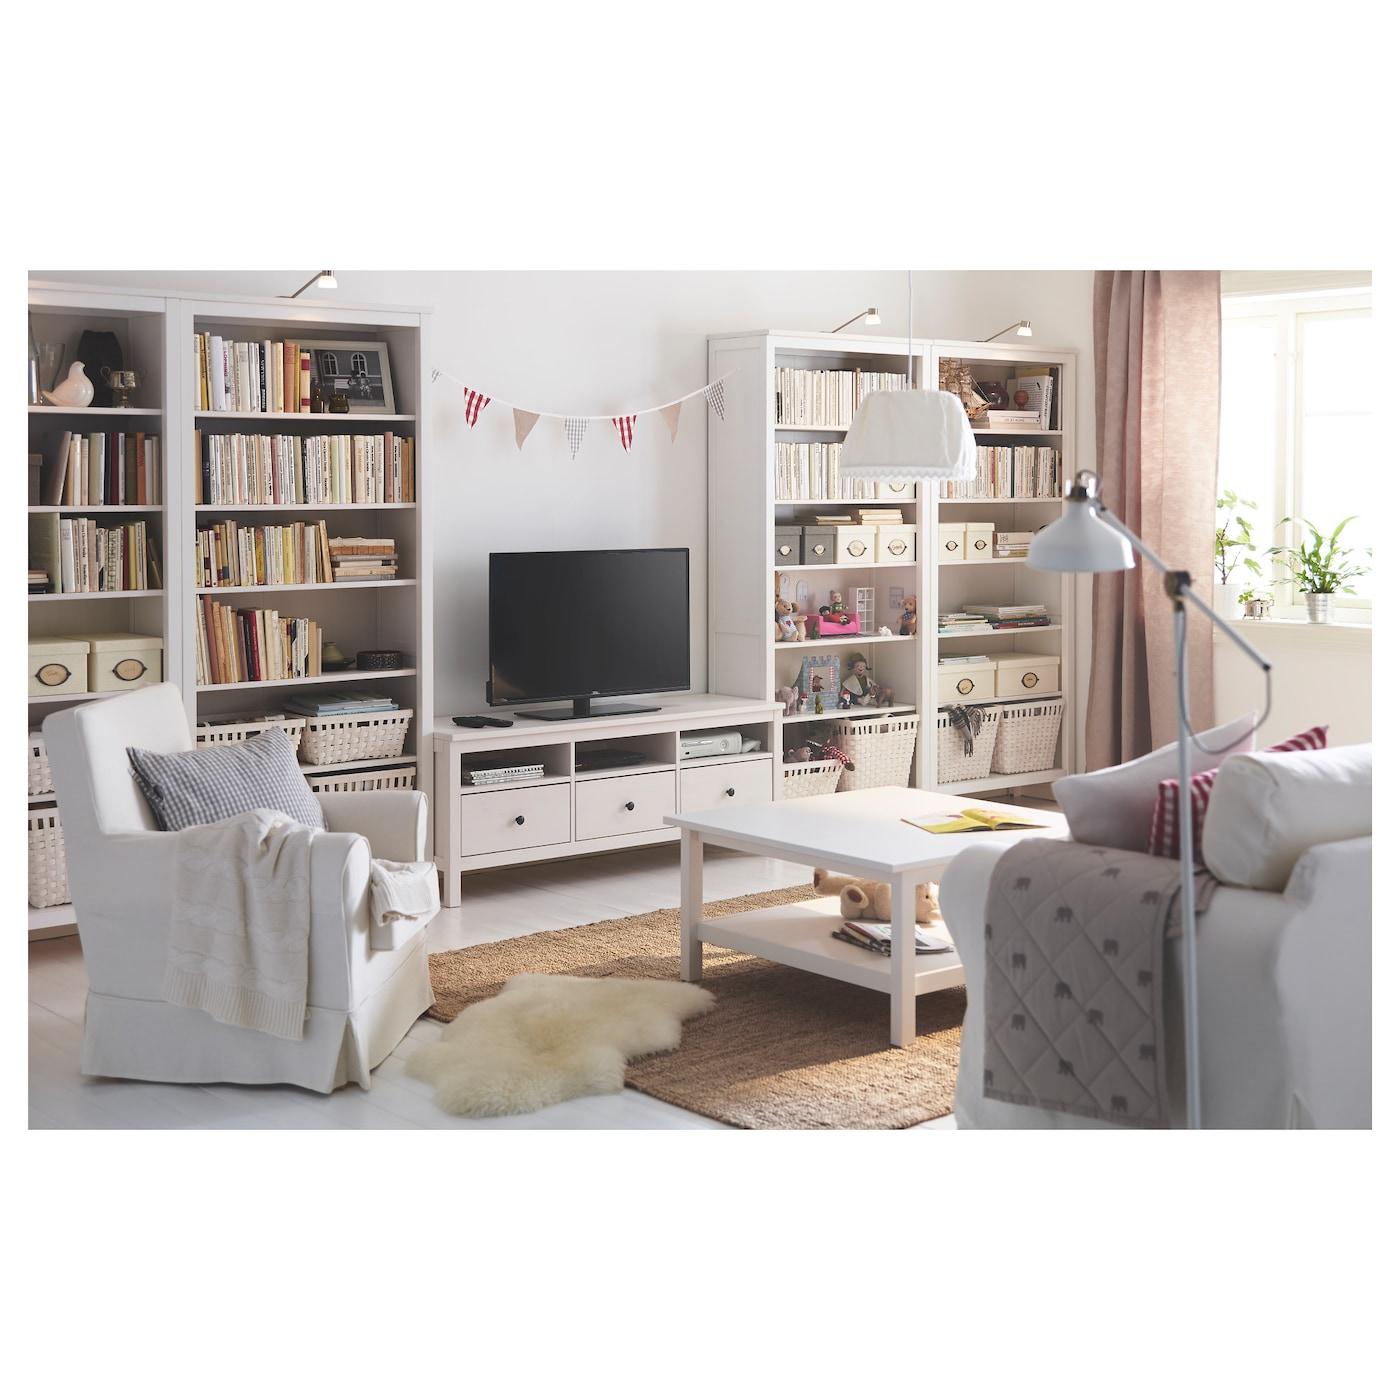 Hemnes Biblioth Que Teint Blanc 90×197 Cm Ikea # Ikea Meuble Tv Bibliotheque